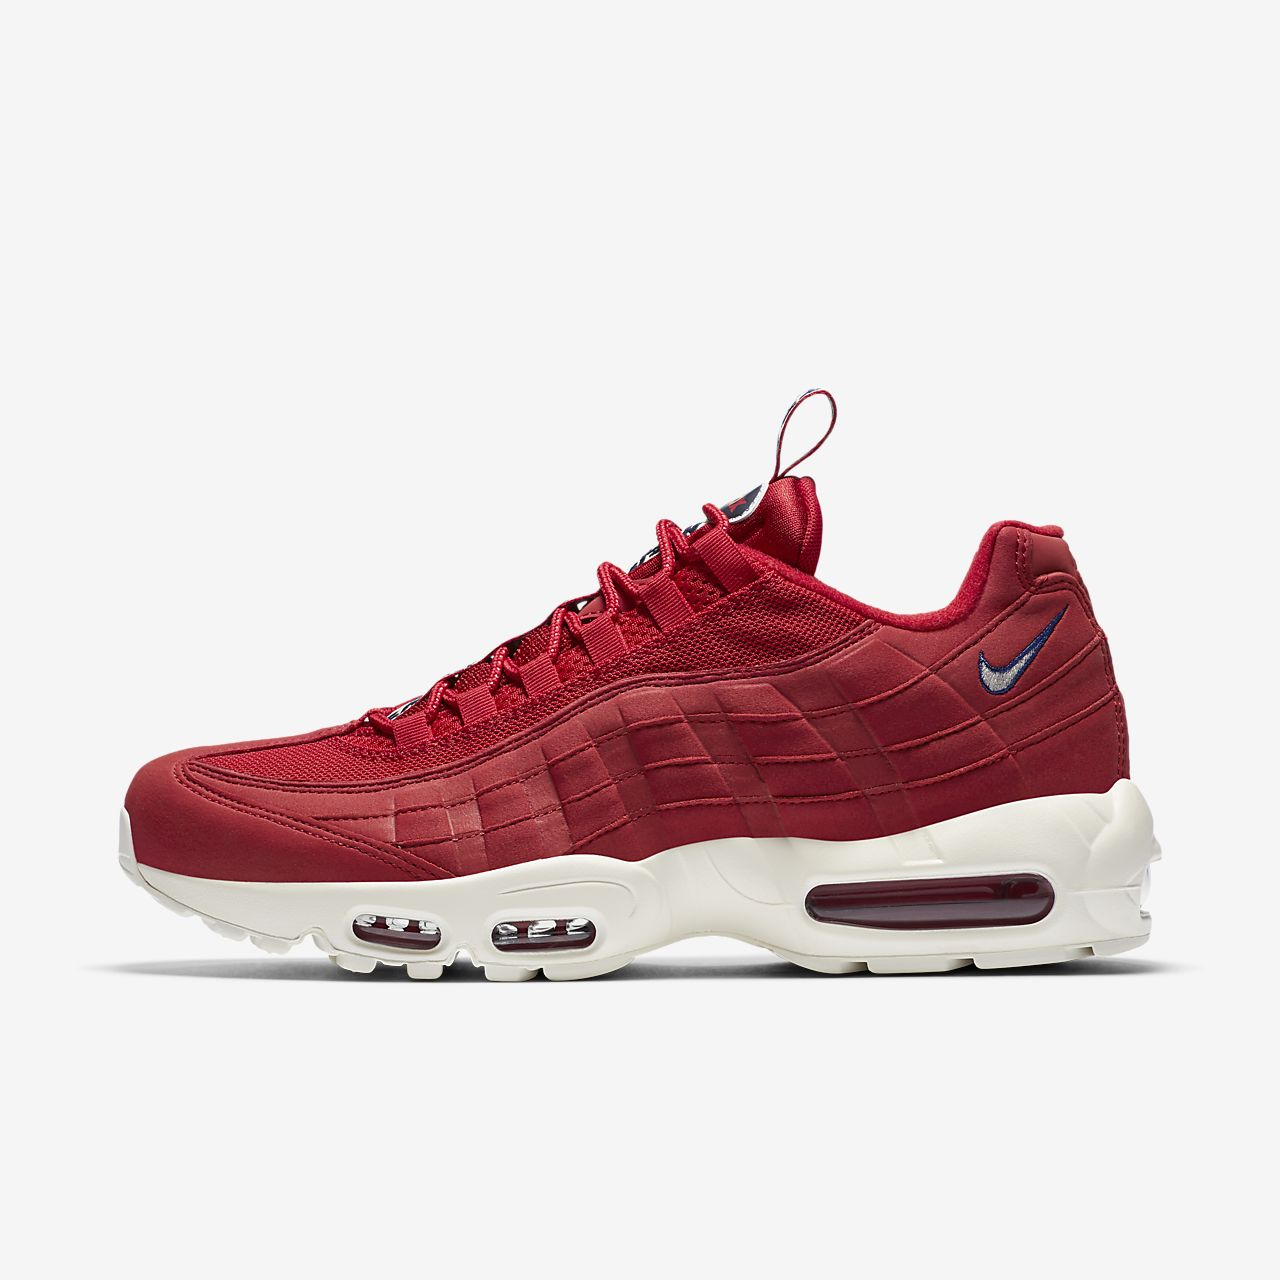 ... Chaussure Nike Air Max 95 pour Homme